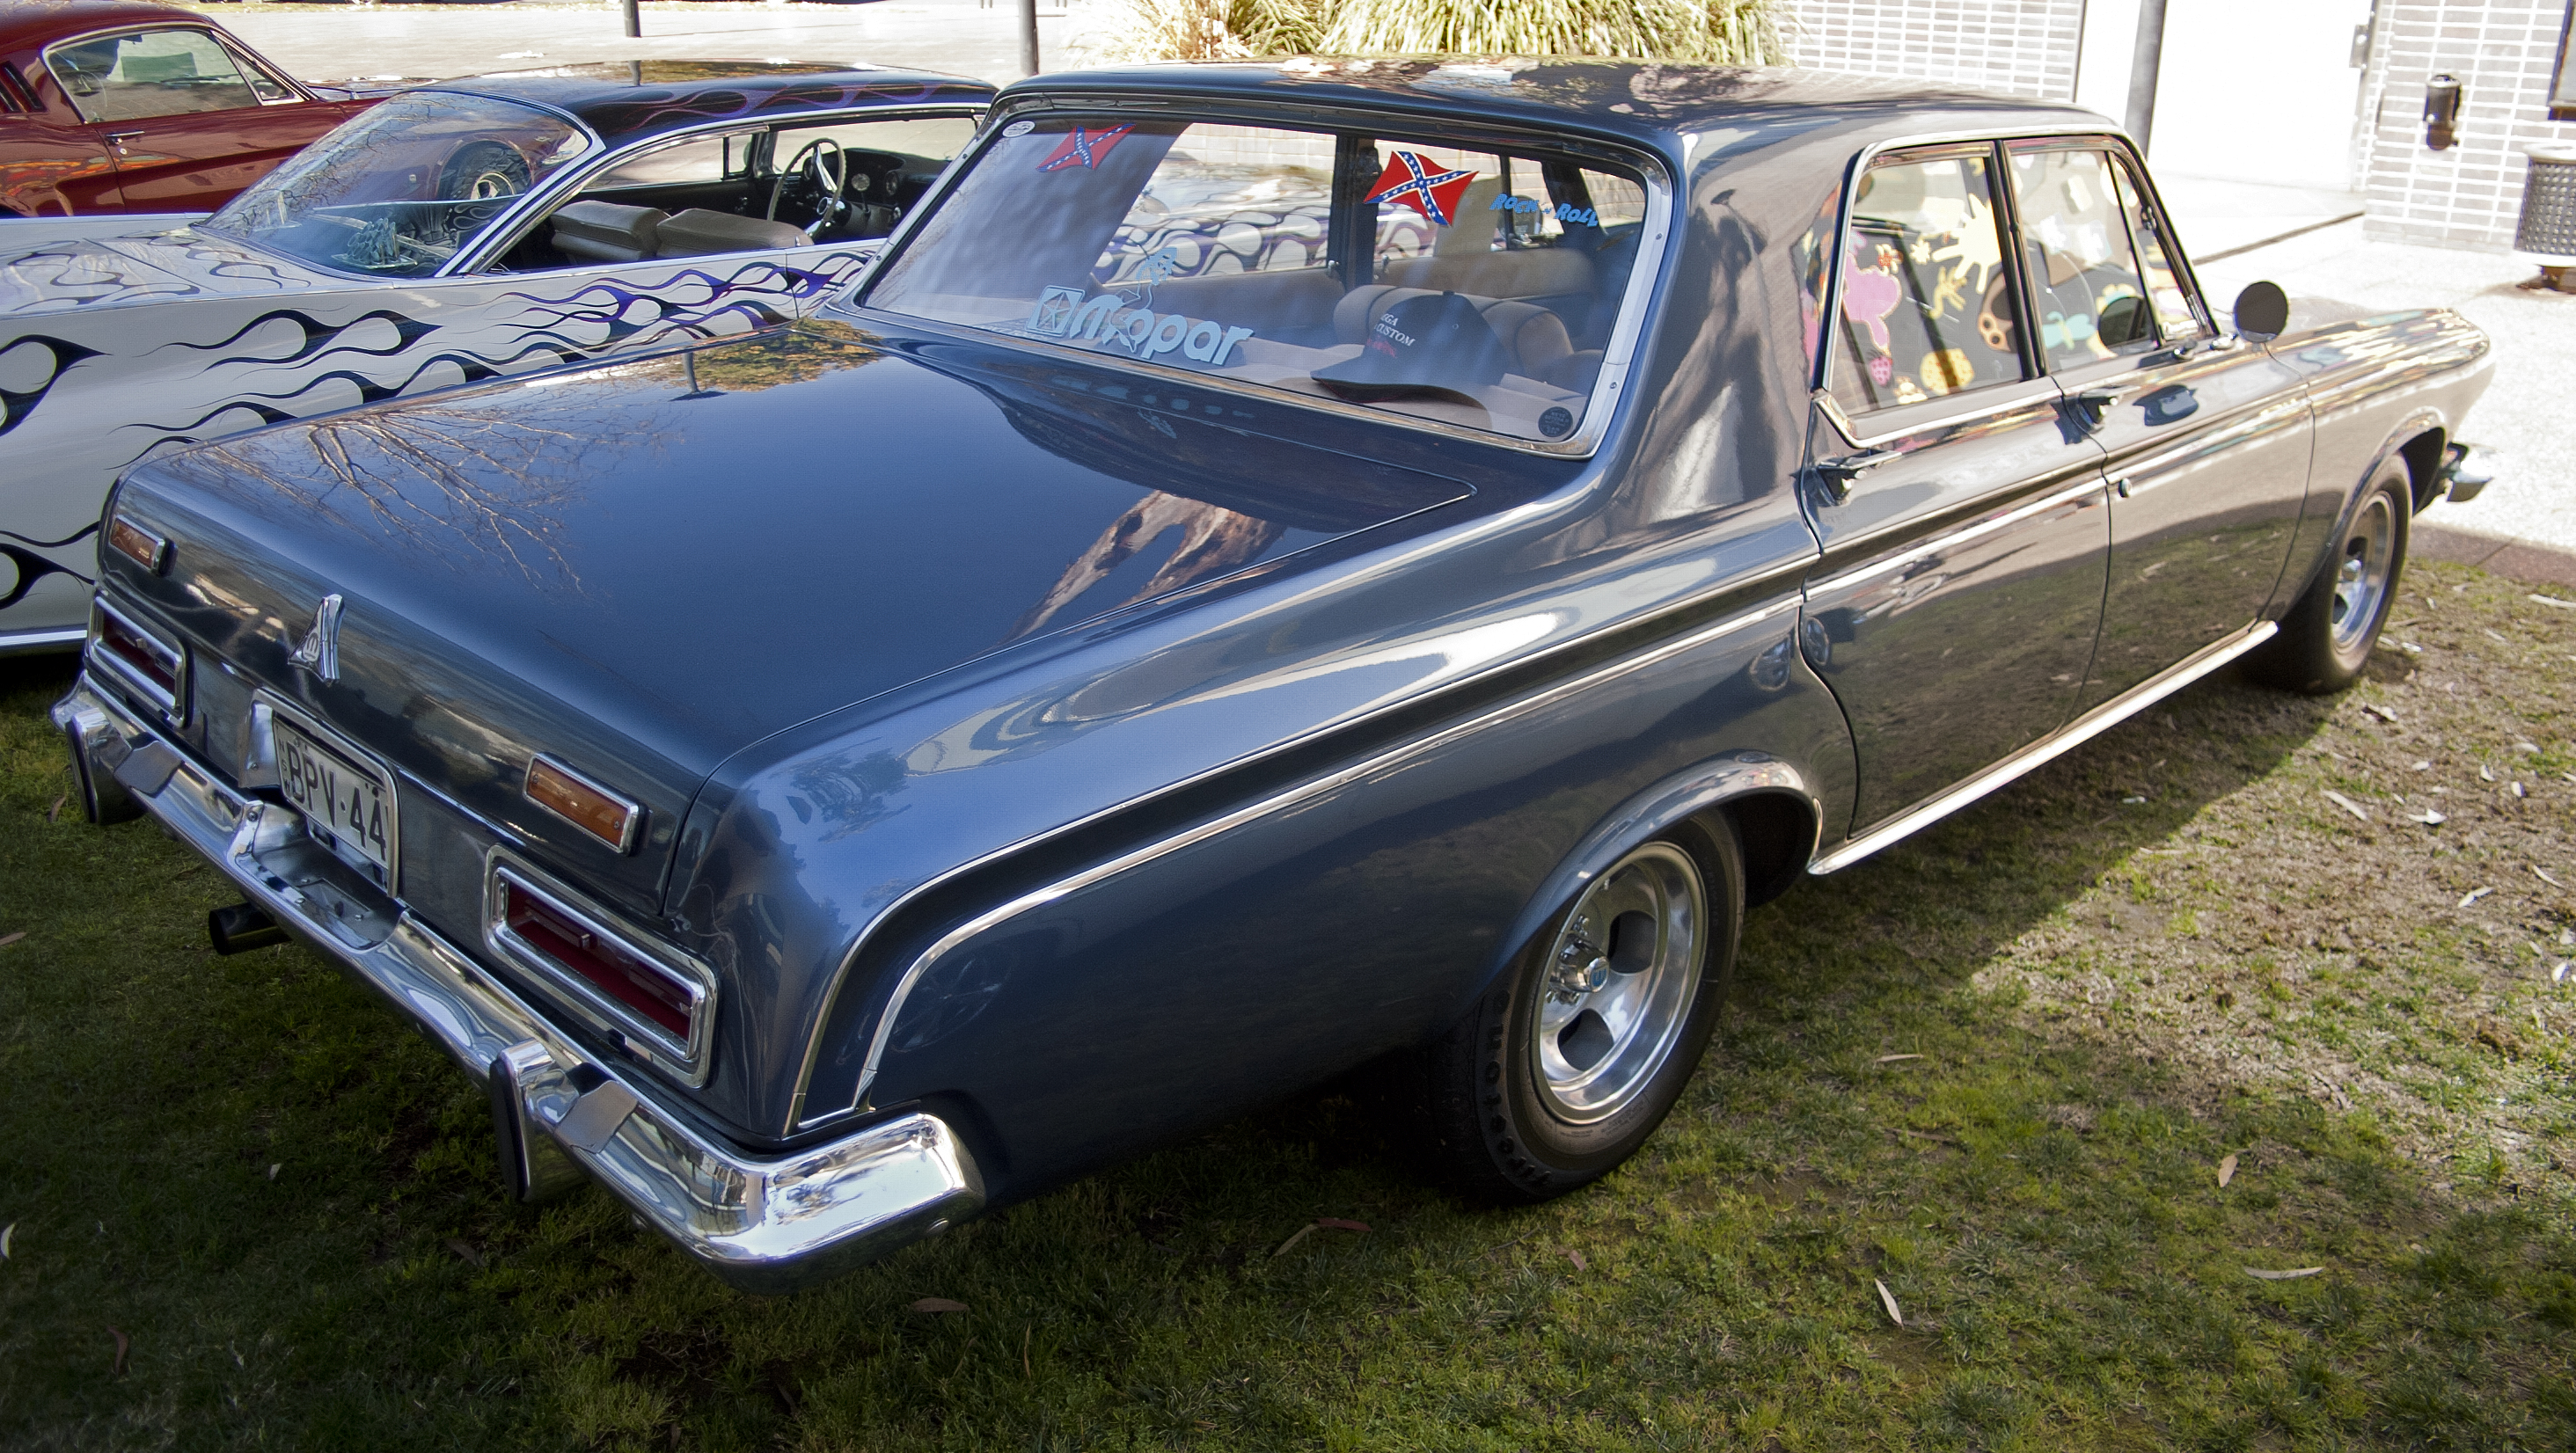 File:1963 Dodge Phoenix (1).jpg - Wikimedia Commons